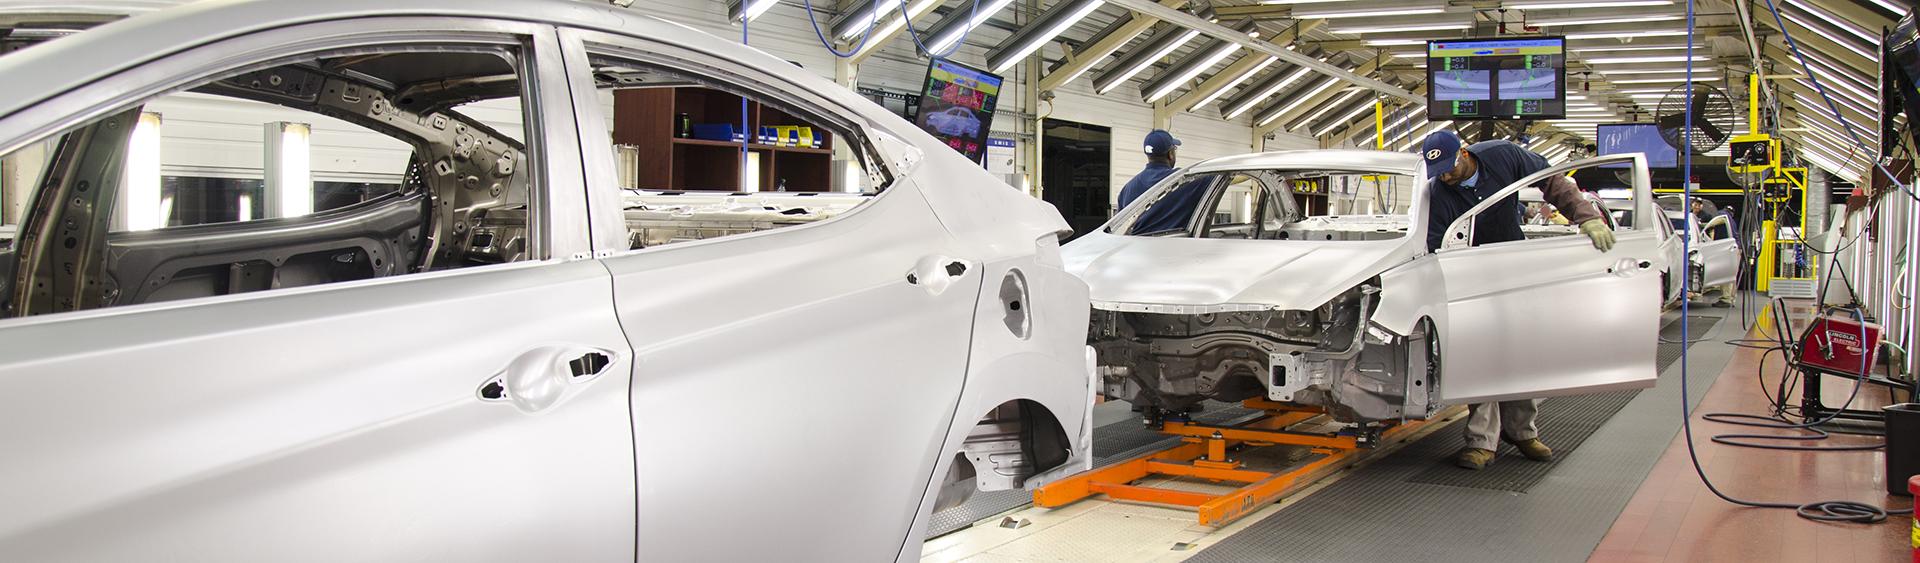 Hyundai Motor Manufacturing Alabama, Montgomery Alabama, Montgomery Area Chamber of Commerce, Montgomery Chamber. MGMChamber